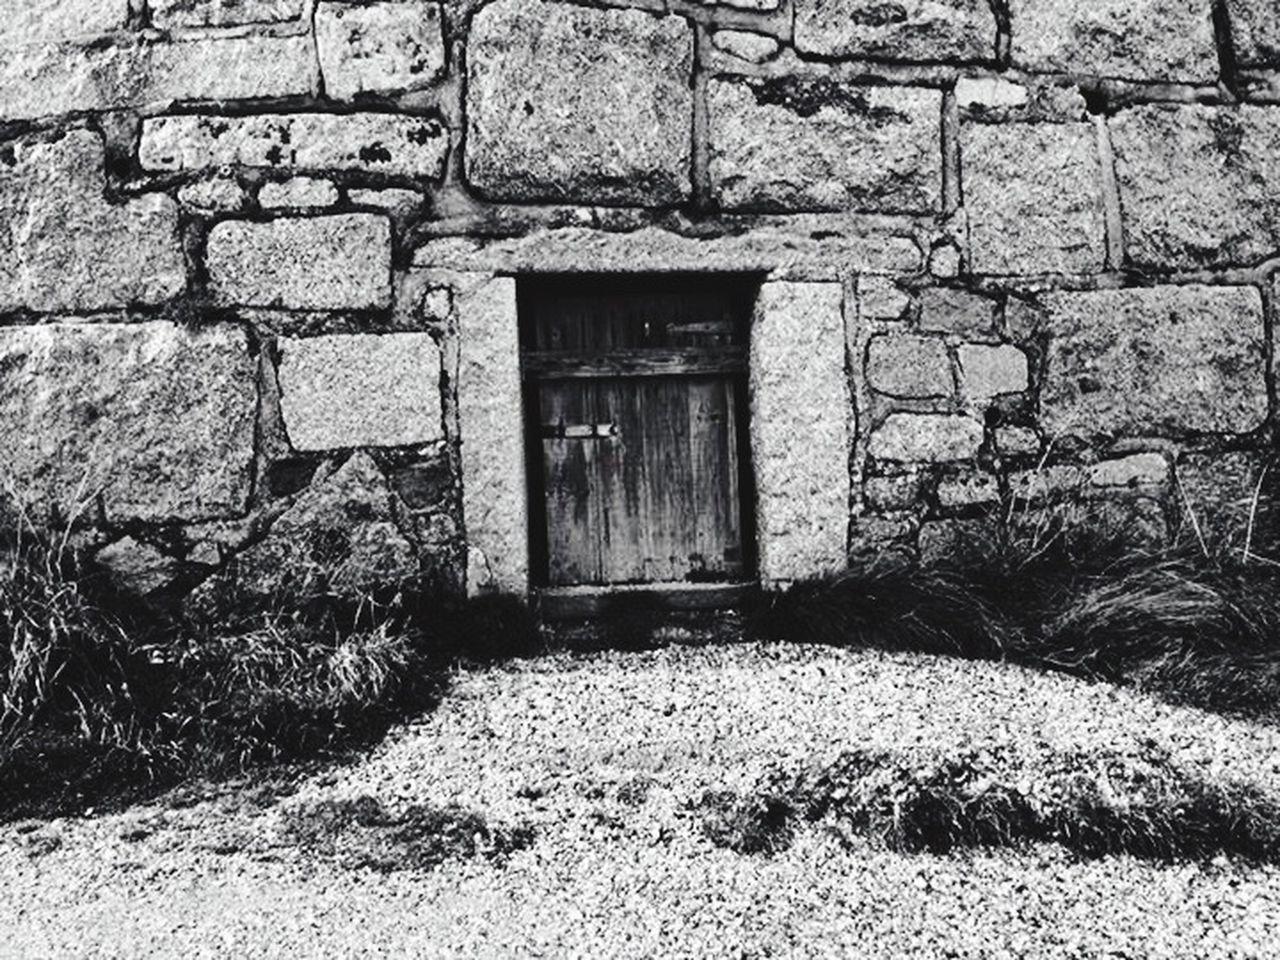 Mysterious Doorway Blackandwhite Photography EyeEm Best Shots Taken In Cornwall By The Sea EyeEm Best Shots - Black + White EyeEm Gallery Historical